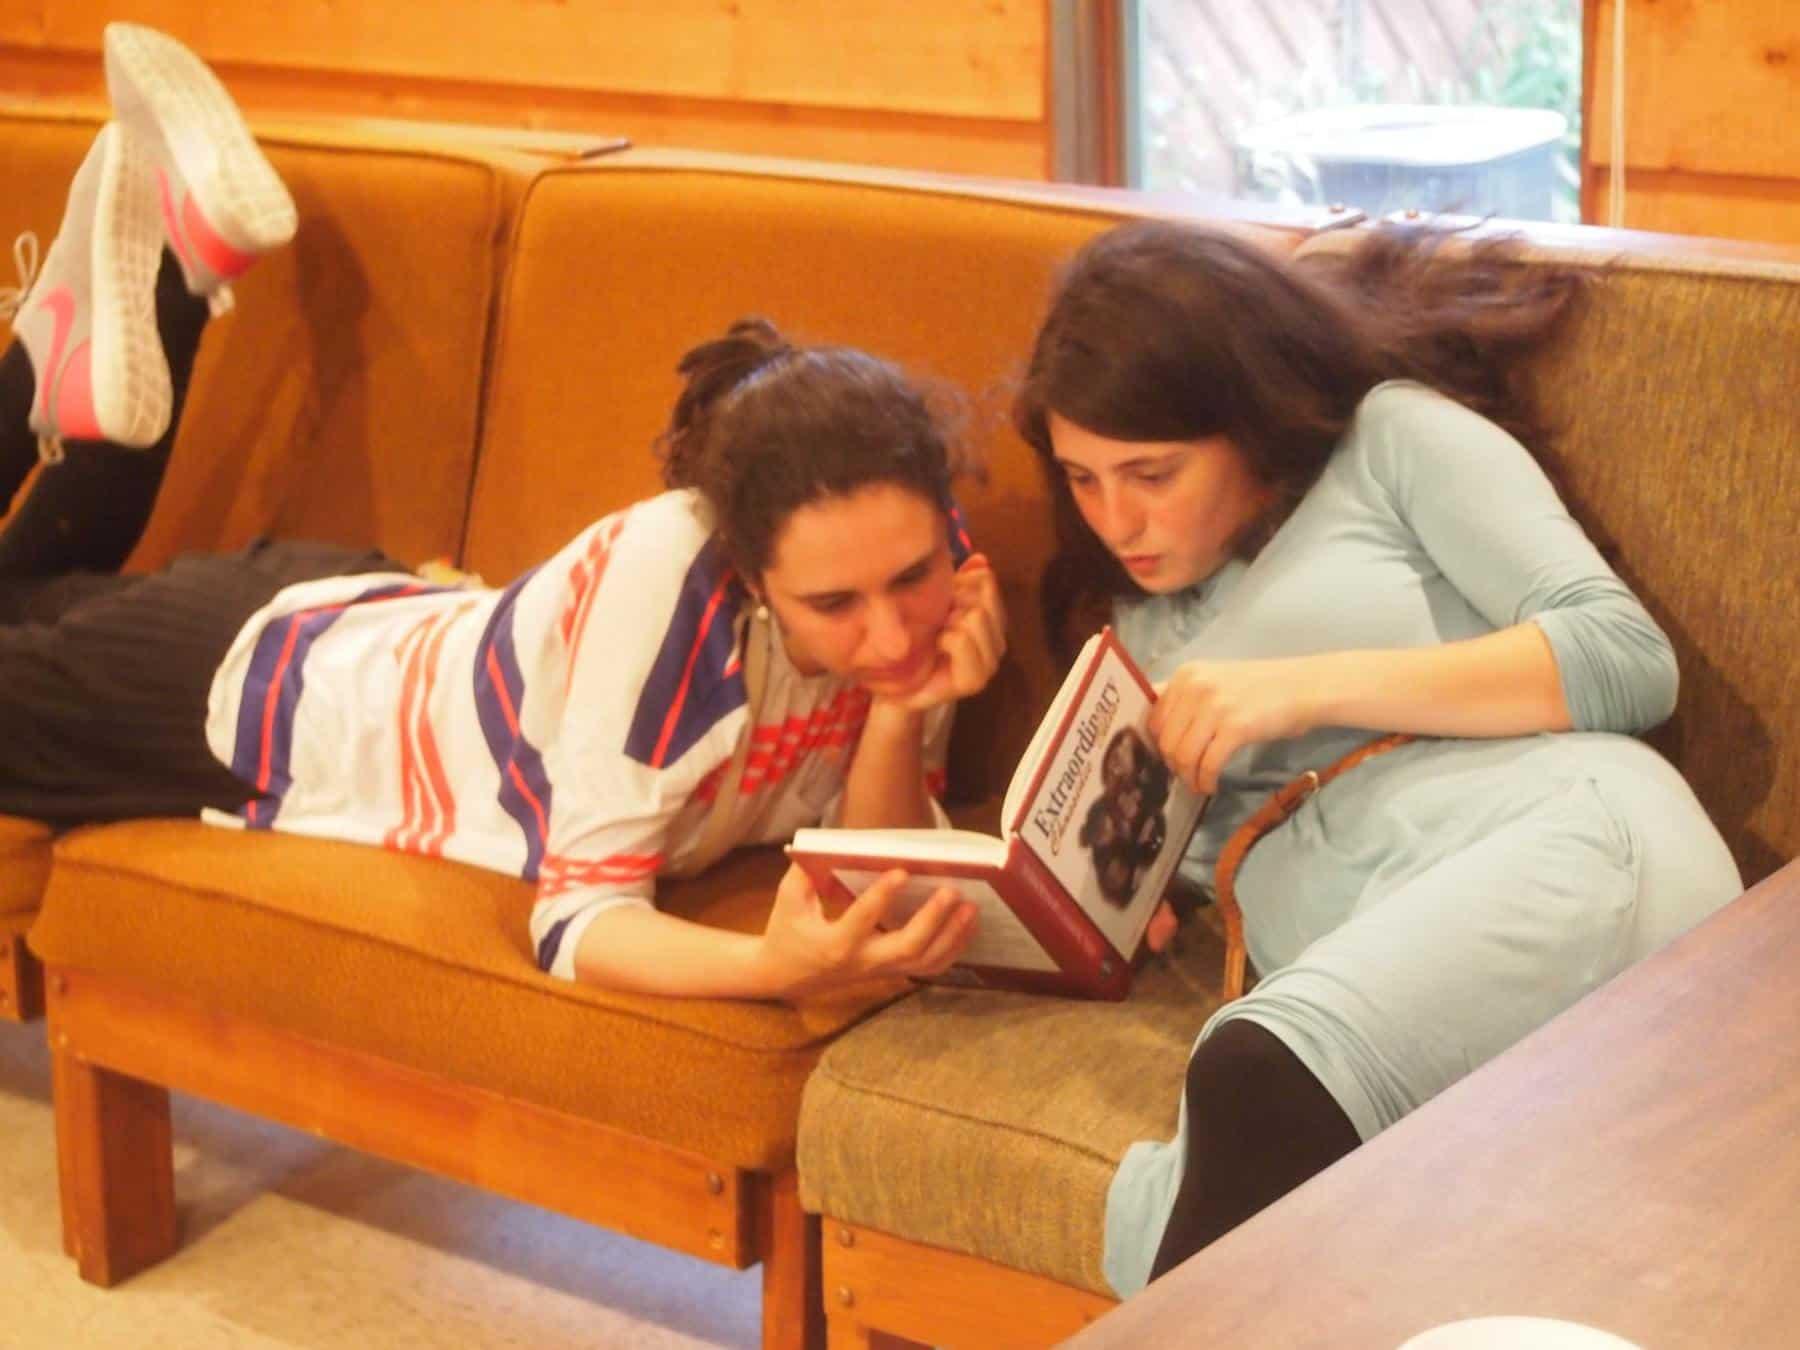 chana jewish singles Shadchanim in all areas:  shidduchim with chabad singles: 5: mrs chana calmenson: brooklyn, ny, us  jewish young professionals,.